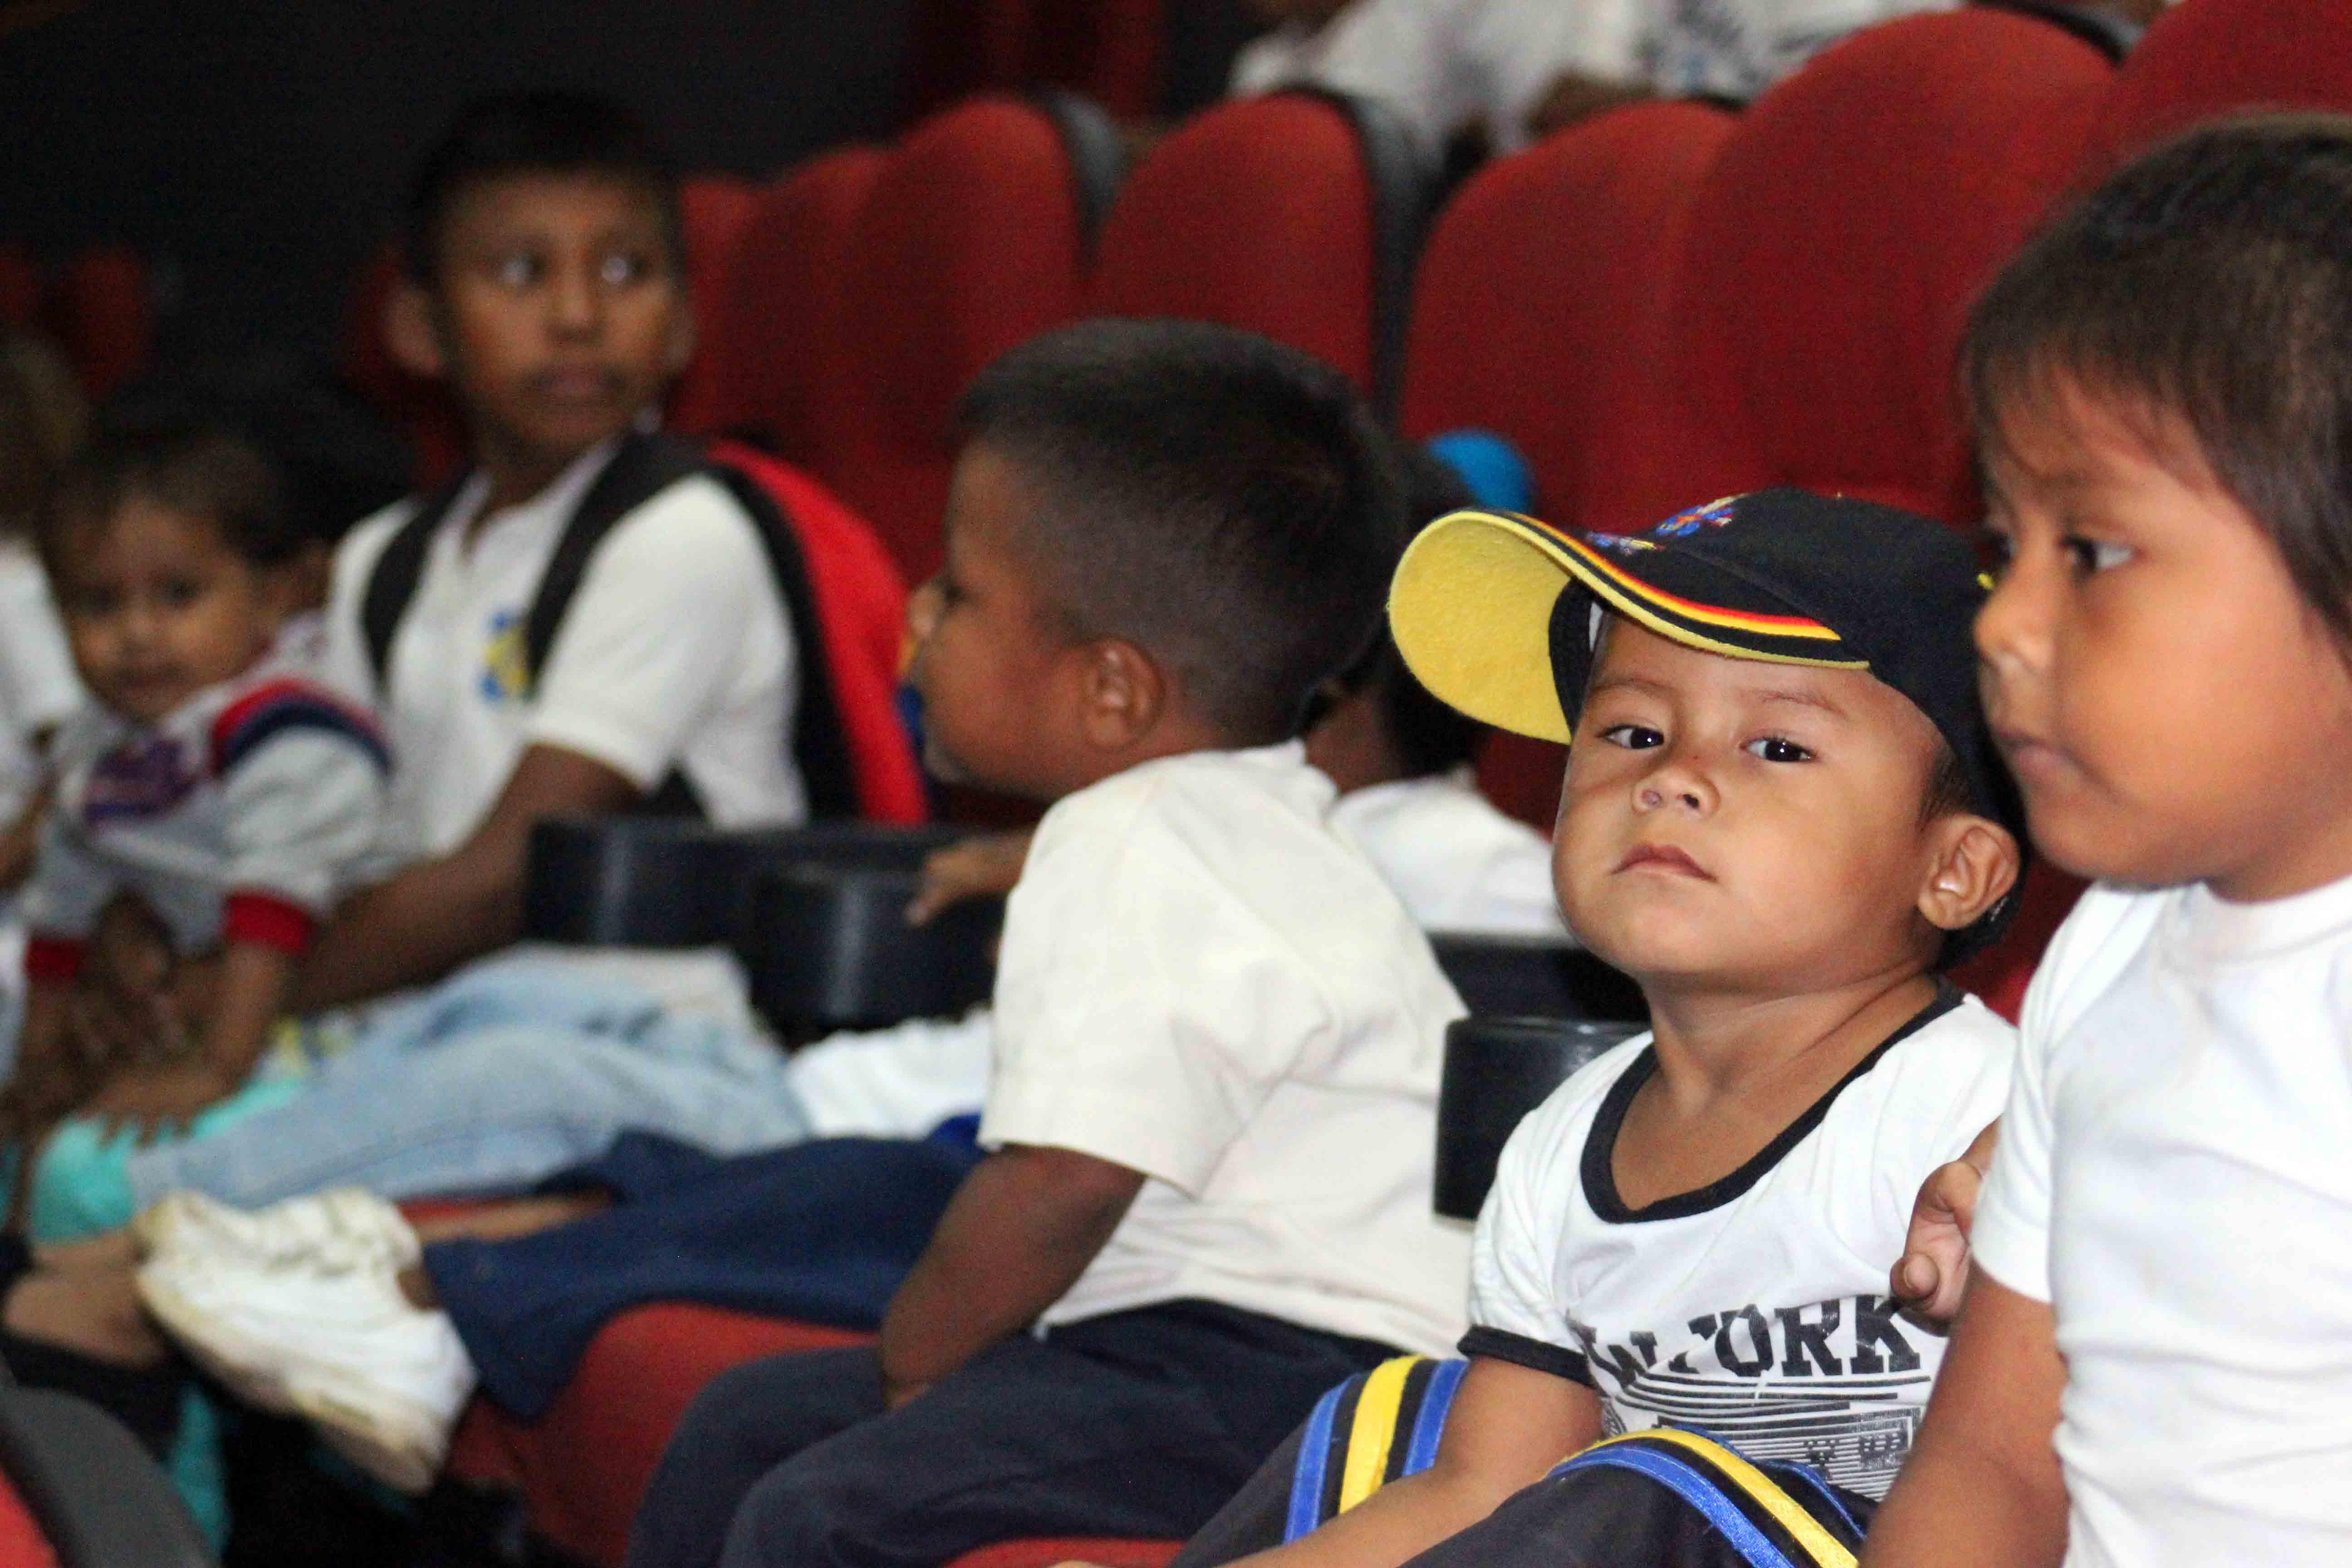 Gmcp garantiza Navidades Felices a través de cine-foro y entrega de juguetes (3)